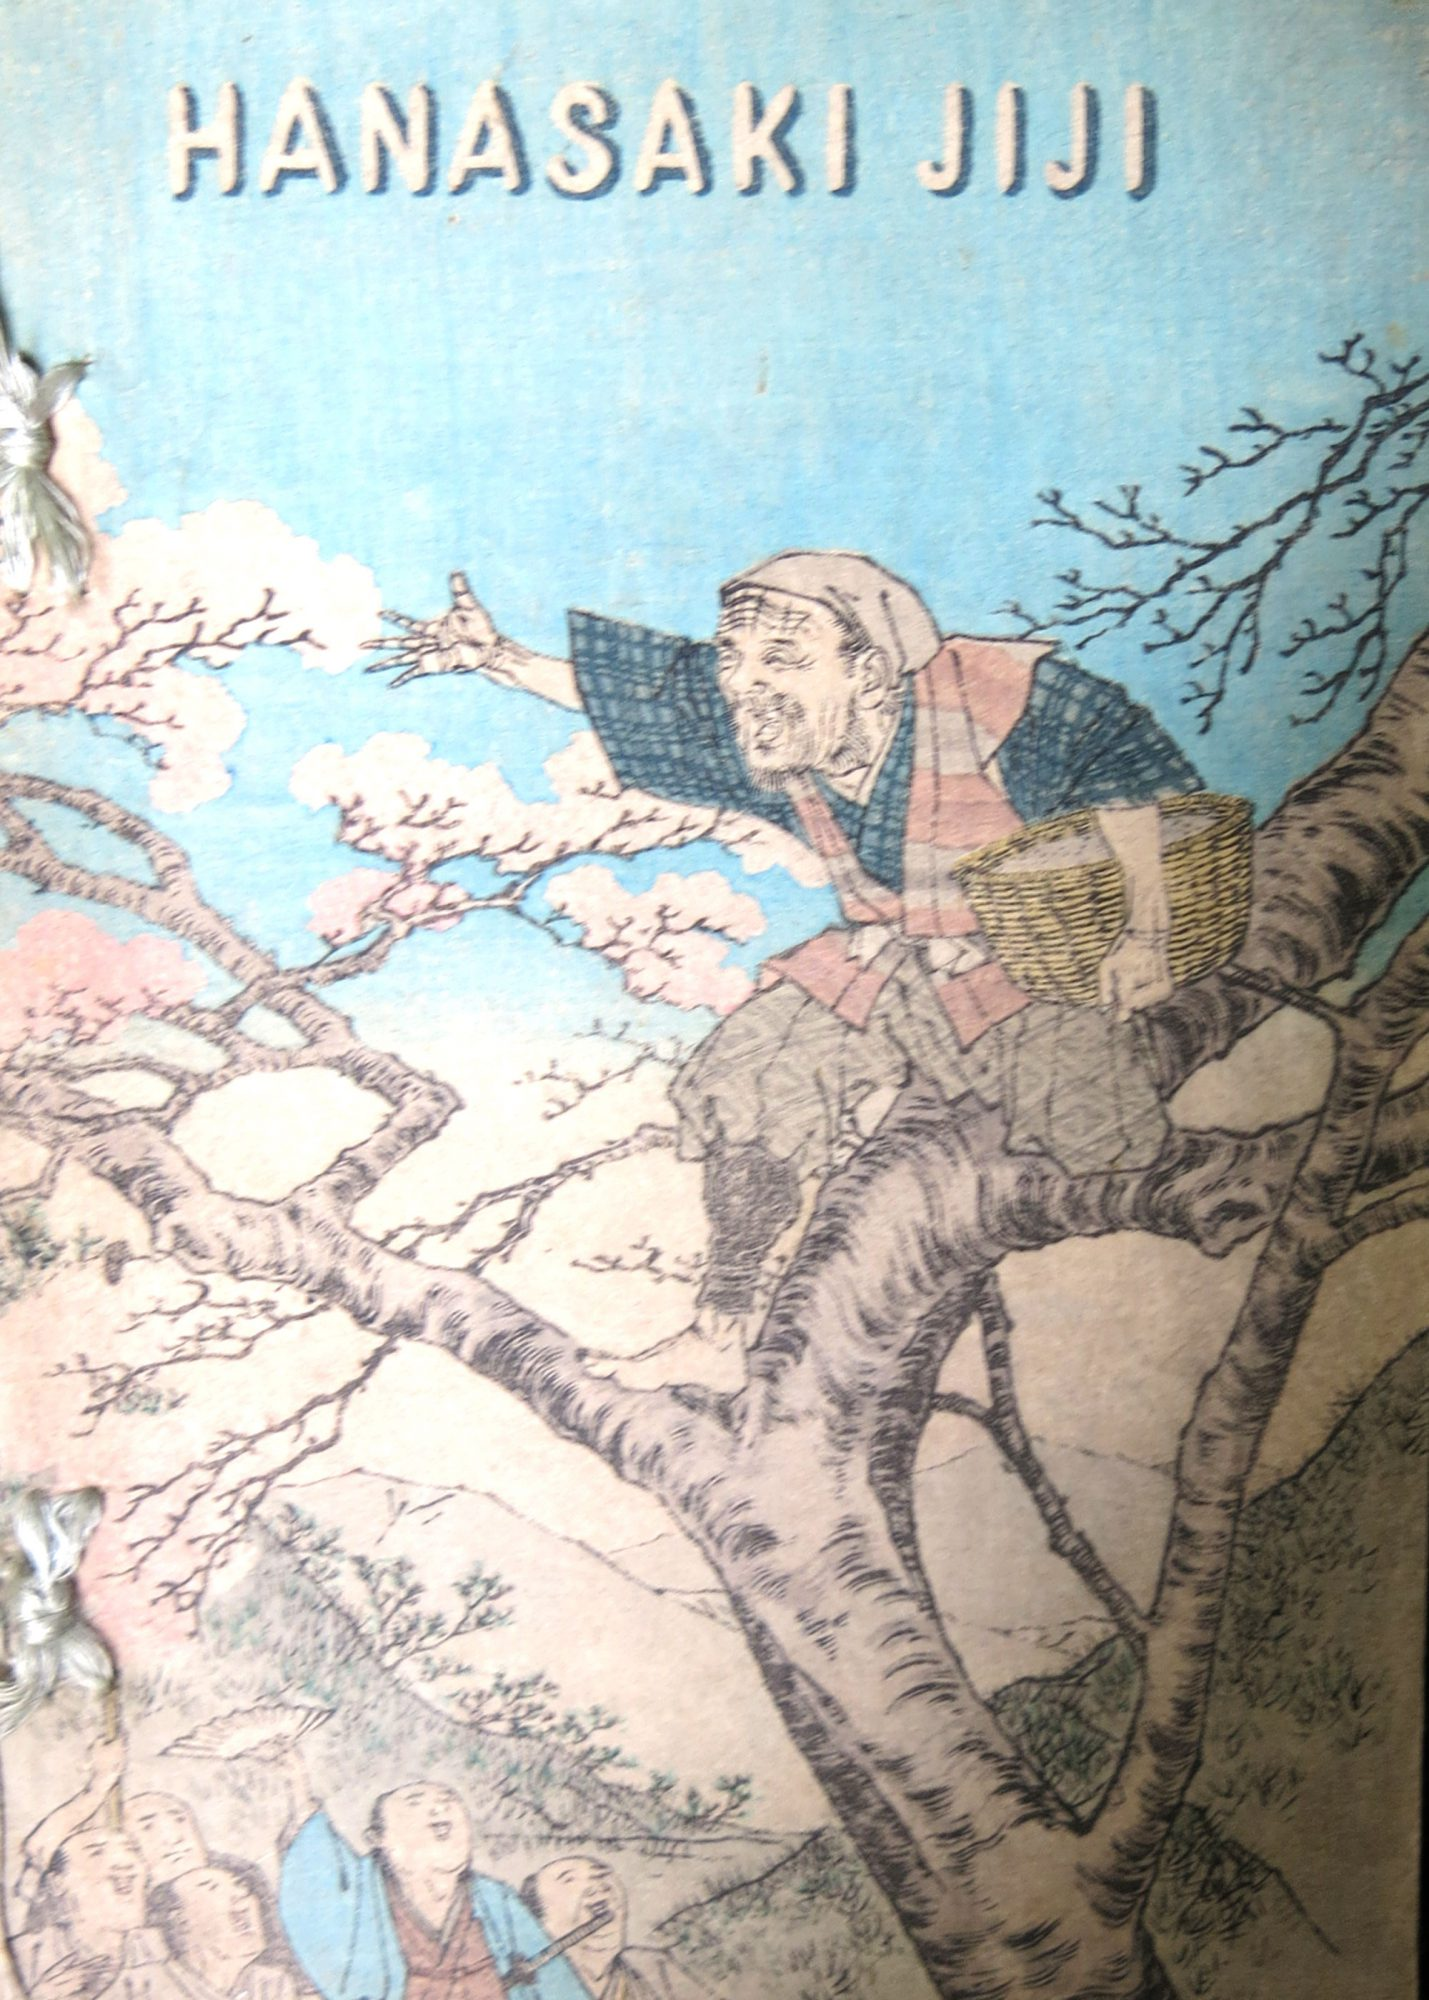 Hanasaki jiji (ou zizi), Le veillard (sic !) qui fait fleurir les arbres morts traduit par J.[oseph] Dautremer. [Illustrateur : Kobayashi Eitaku (Sansai)]